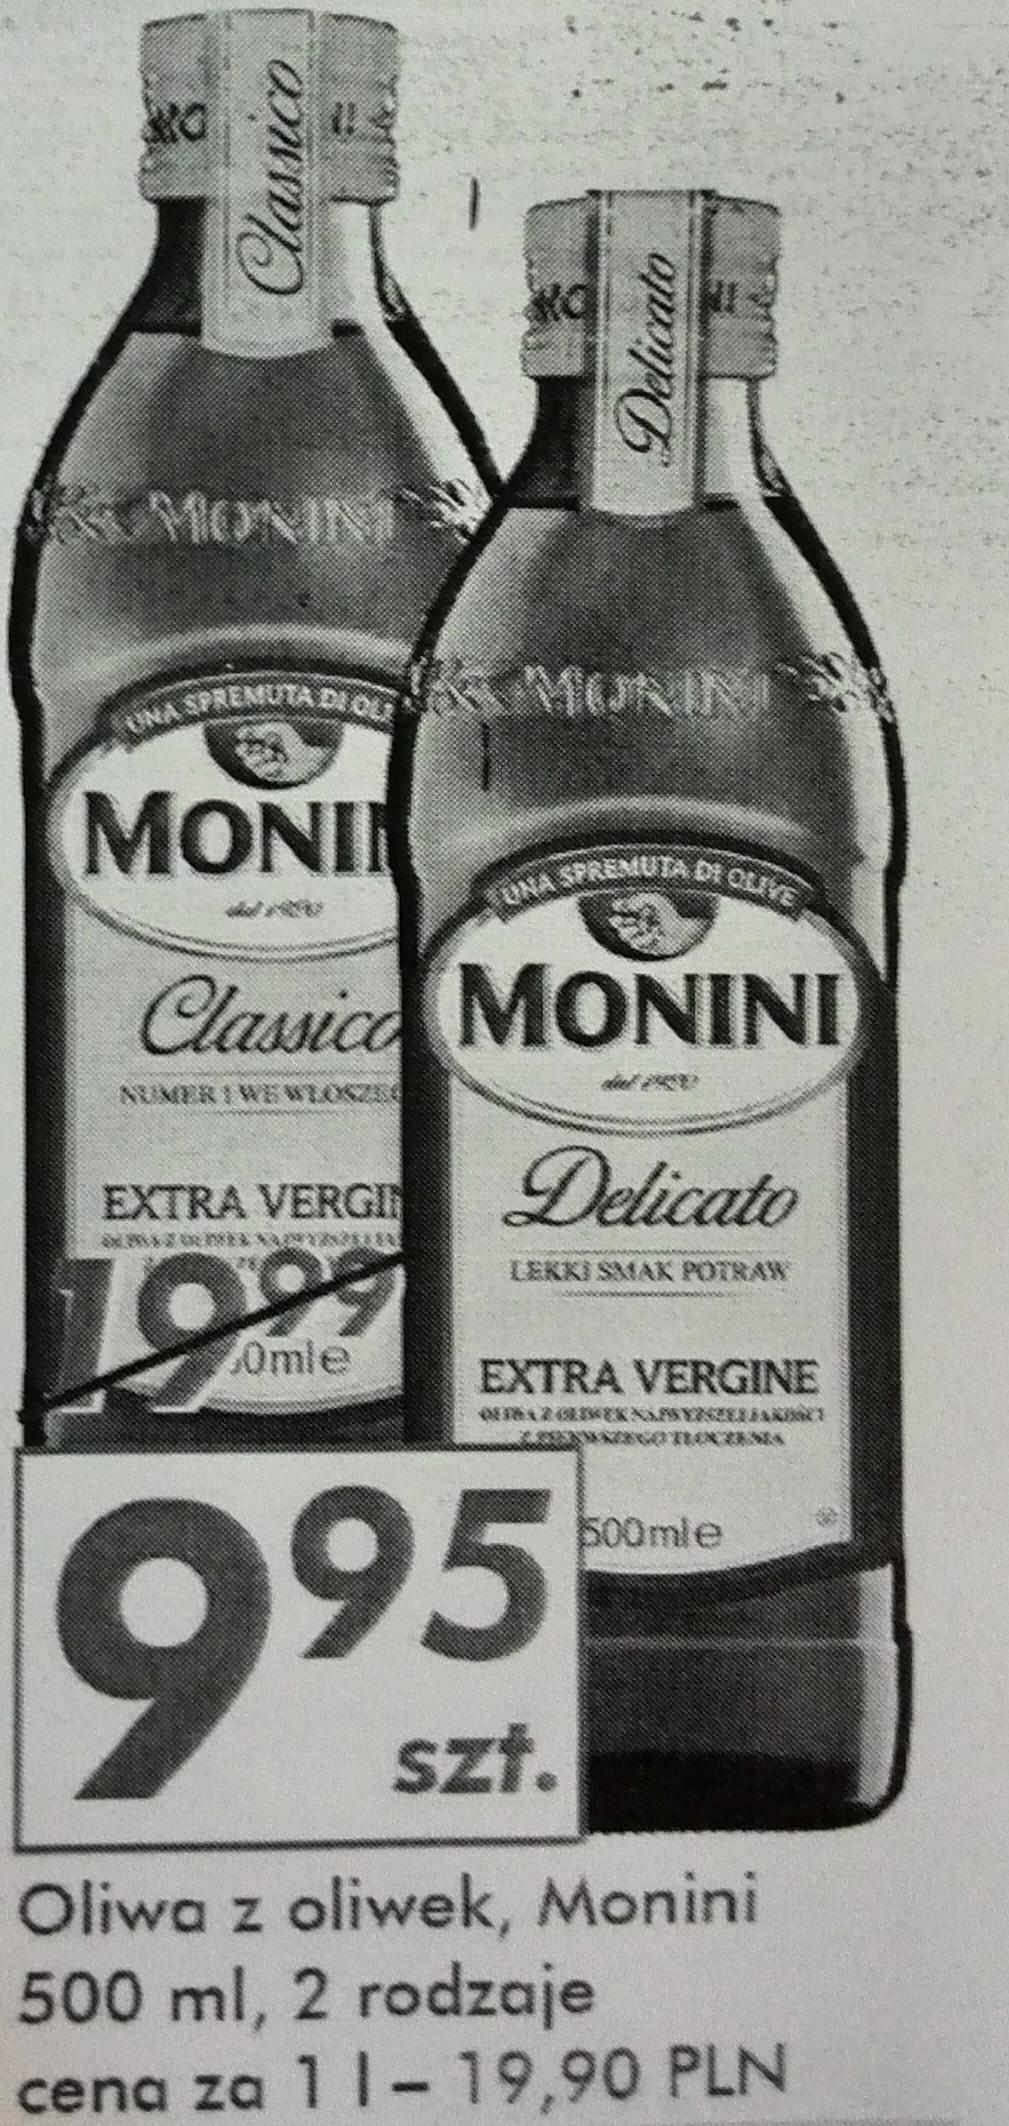 Oliwa z oliwek Extra Vergine - Monini Classico i Delicato @Auchan